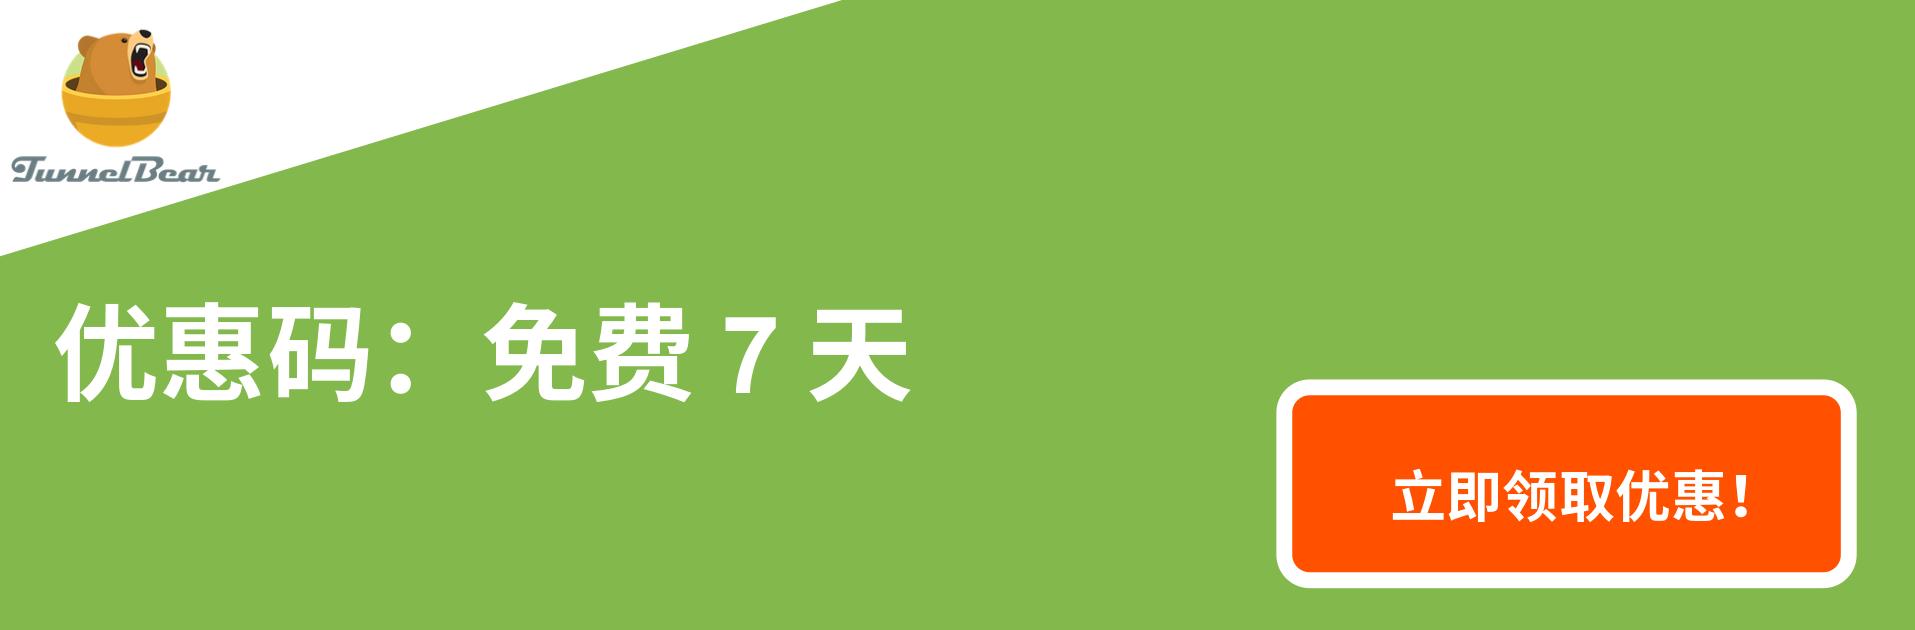 tunnel bear vpn coupon banner 7 days free